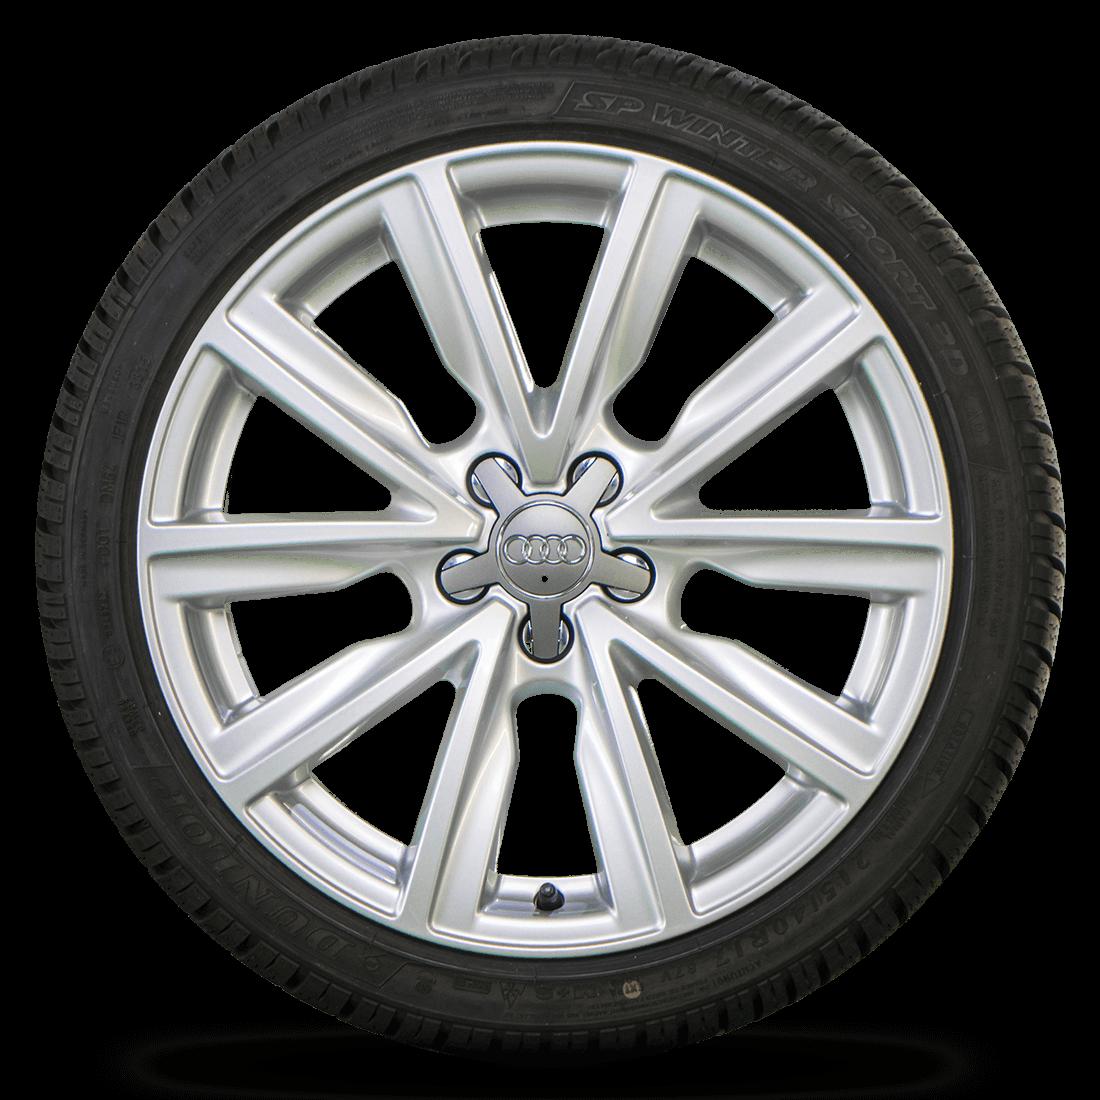 Audi 17 Zoll Felgen A1 S1 8X Alufelgen Winterreifen Winterräder 7-7,5 mm